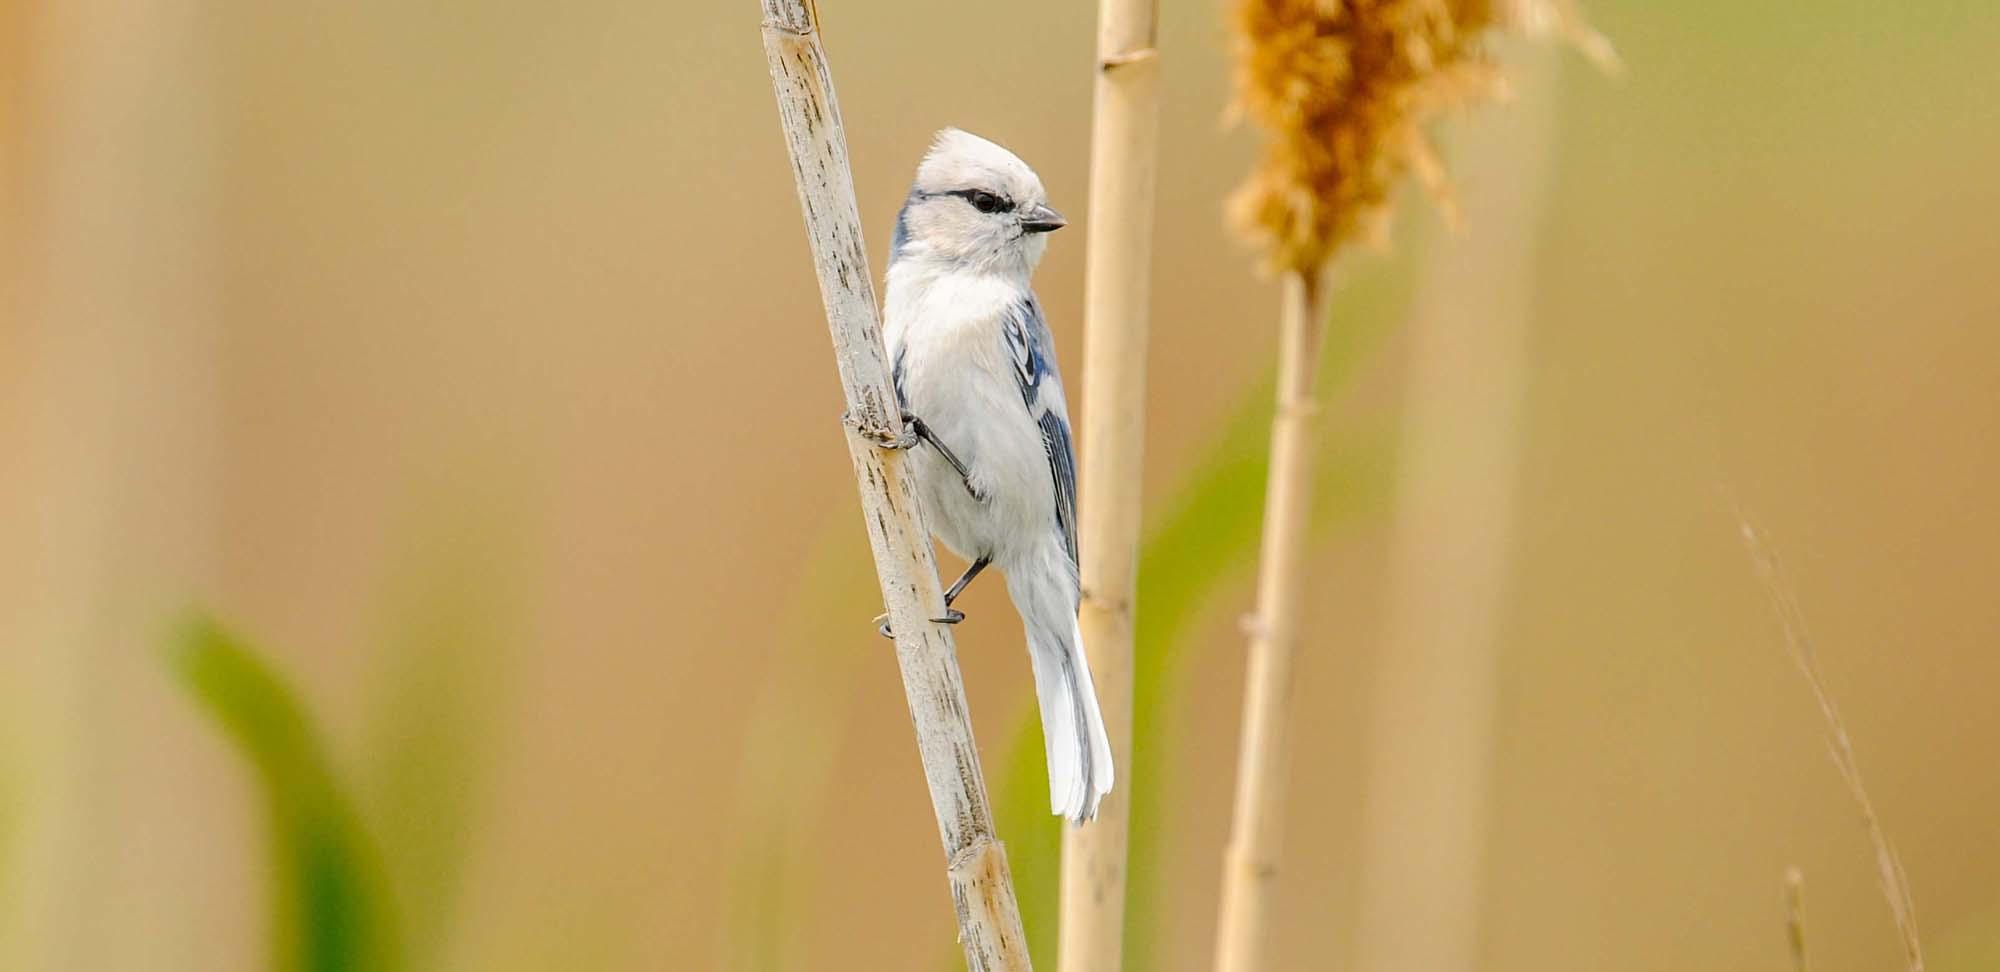 Azure Tit Field Guides Birding Tours Uzbekistan Kazakhstan